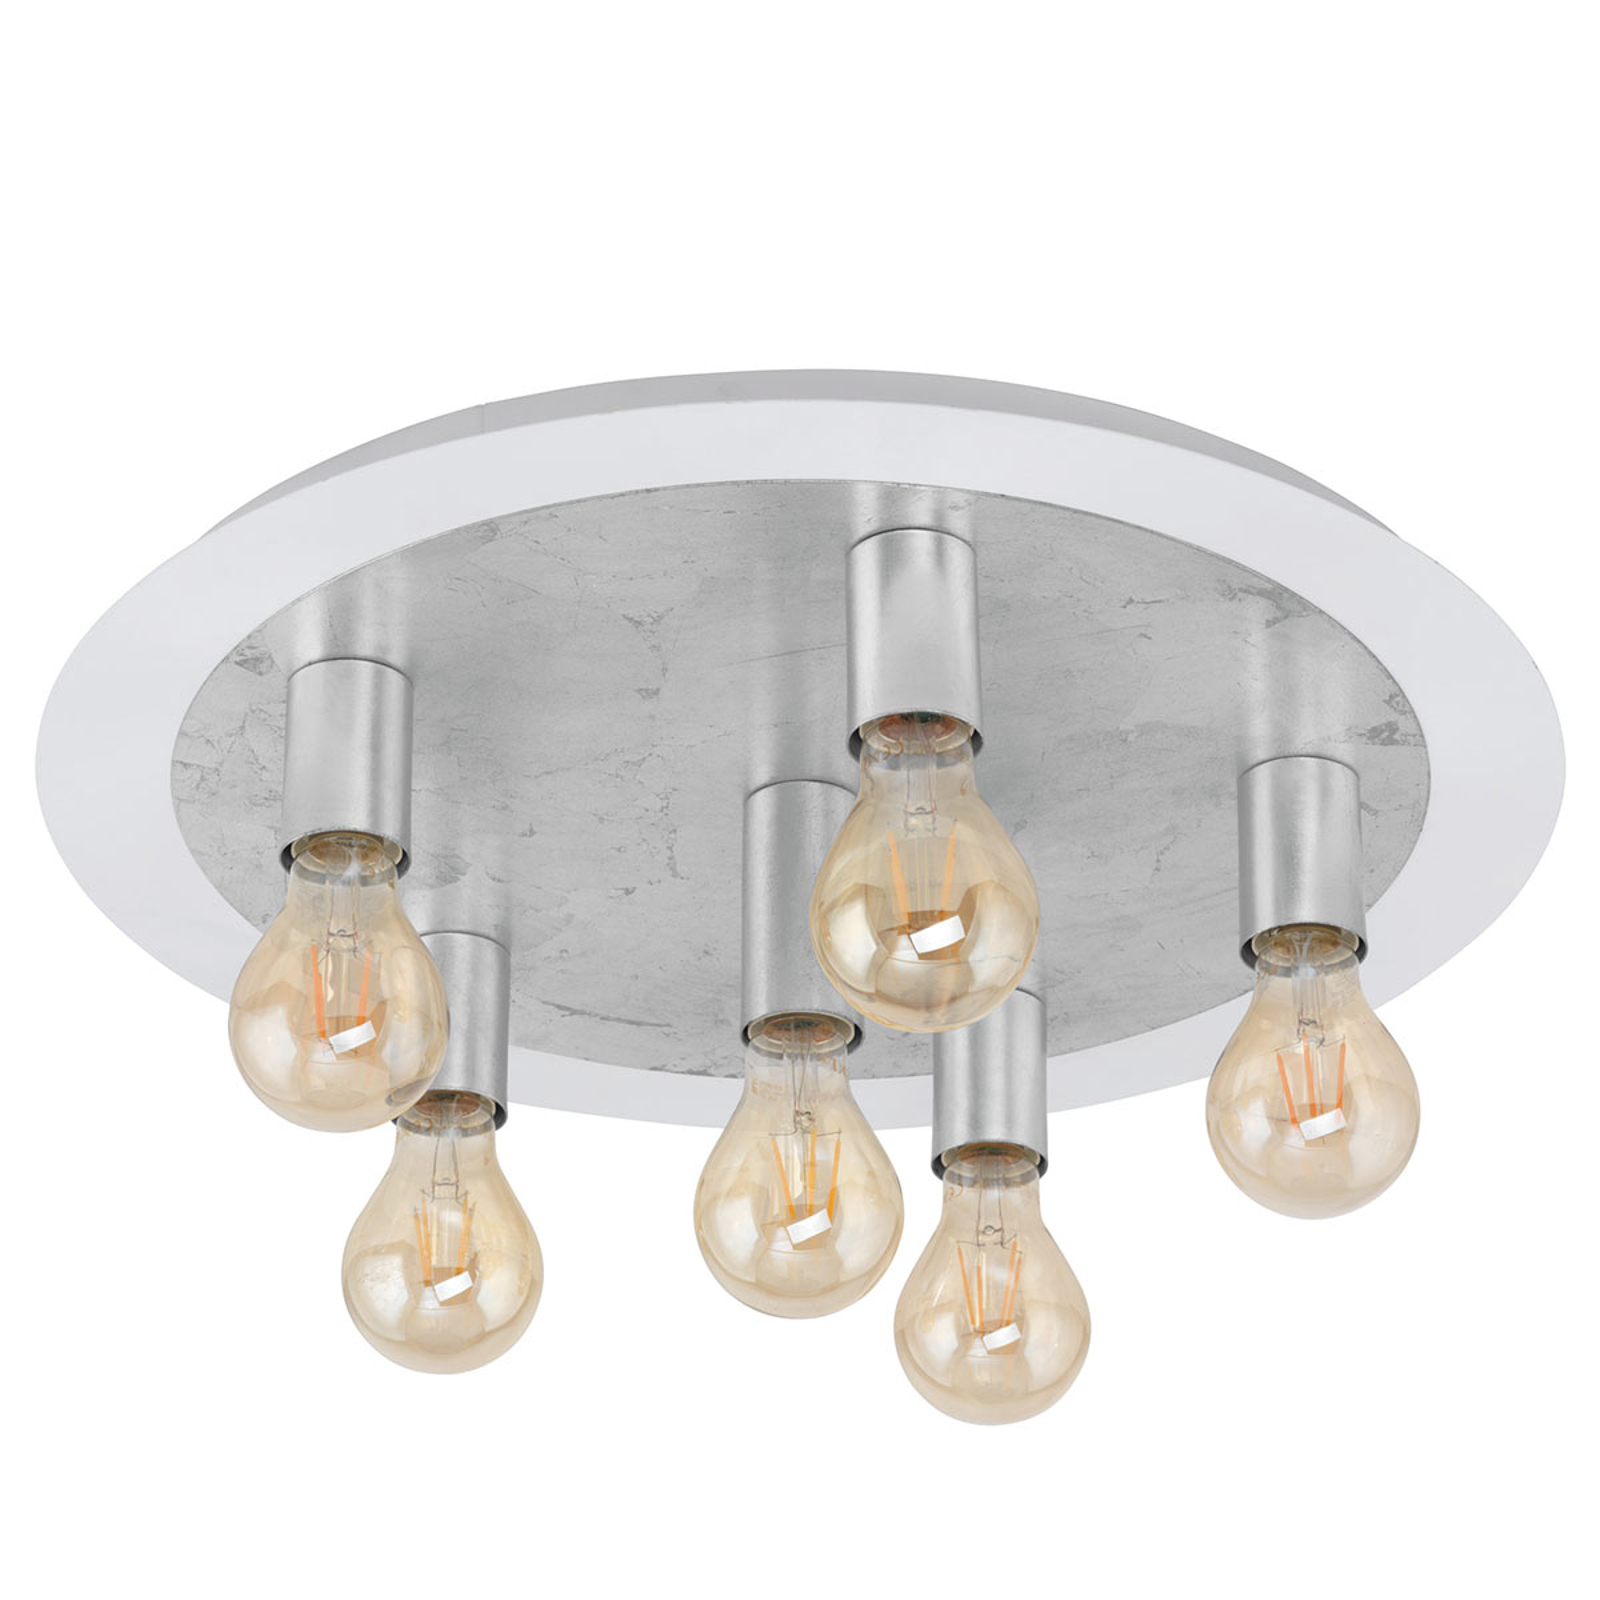 Plafoniera LED Passano 6 luci argento